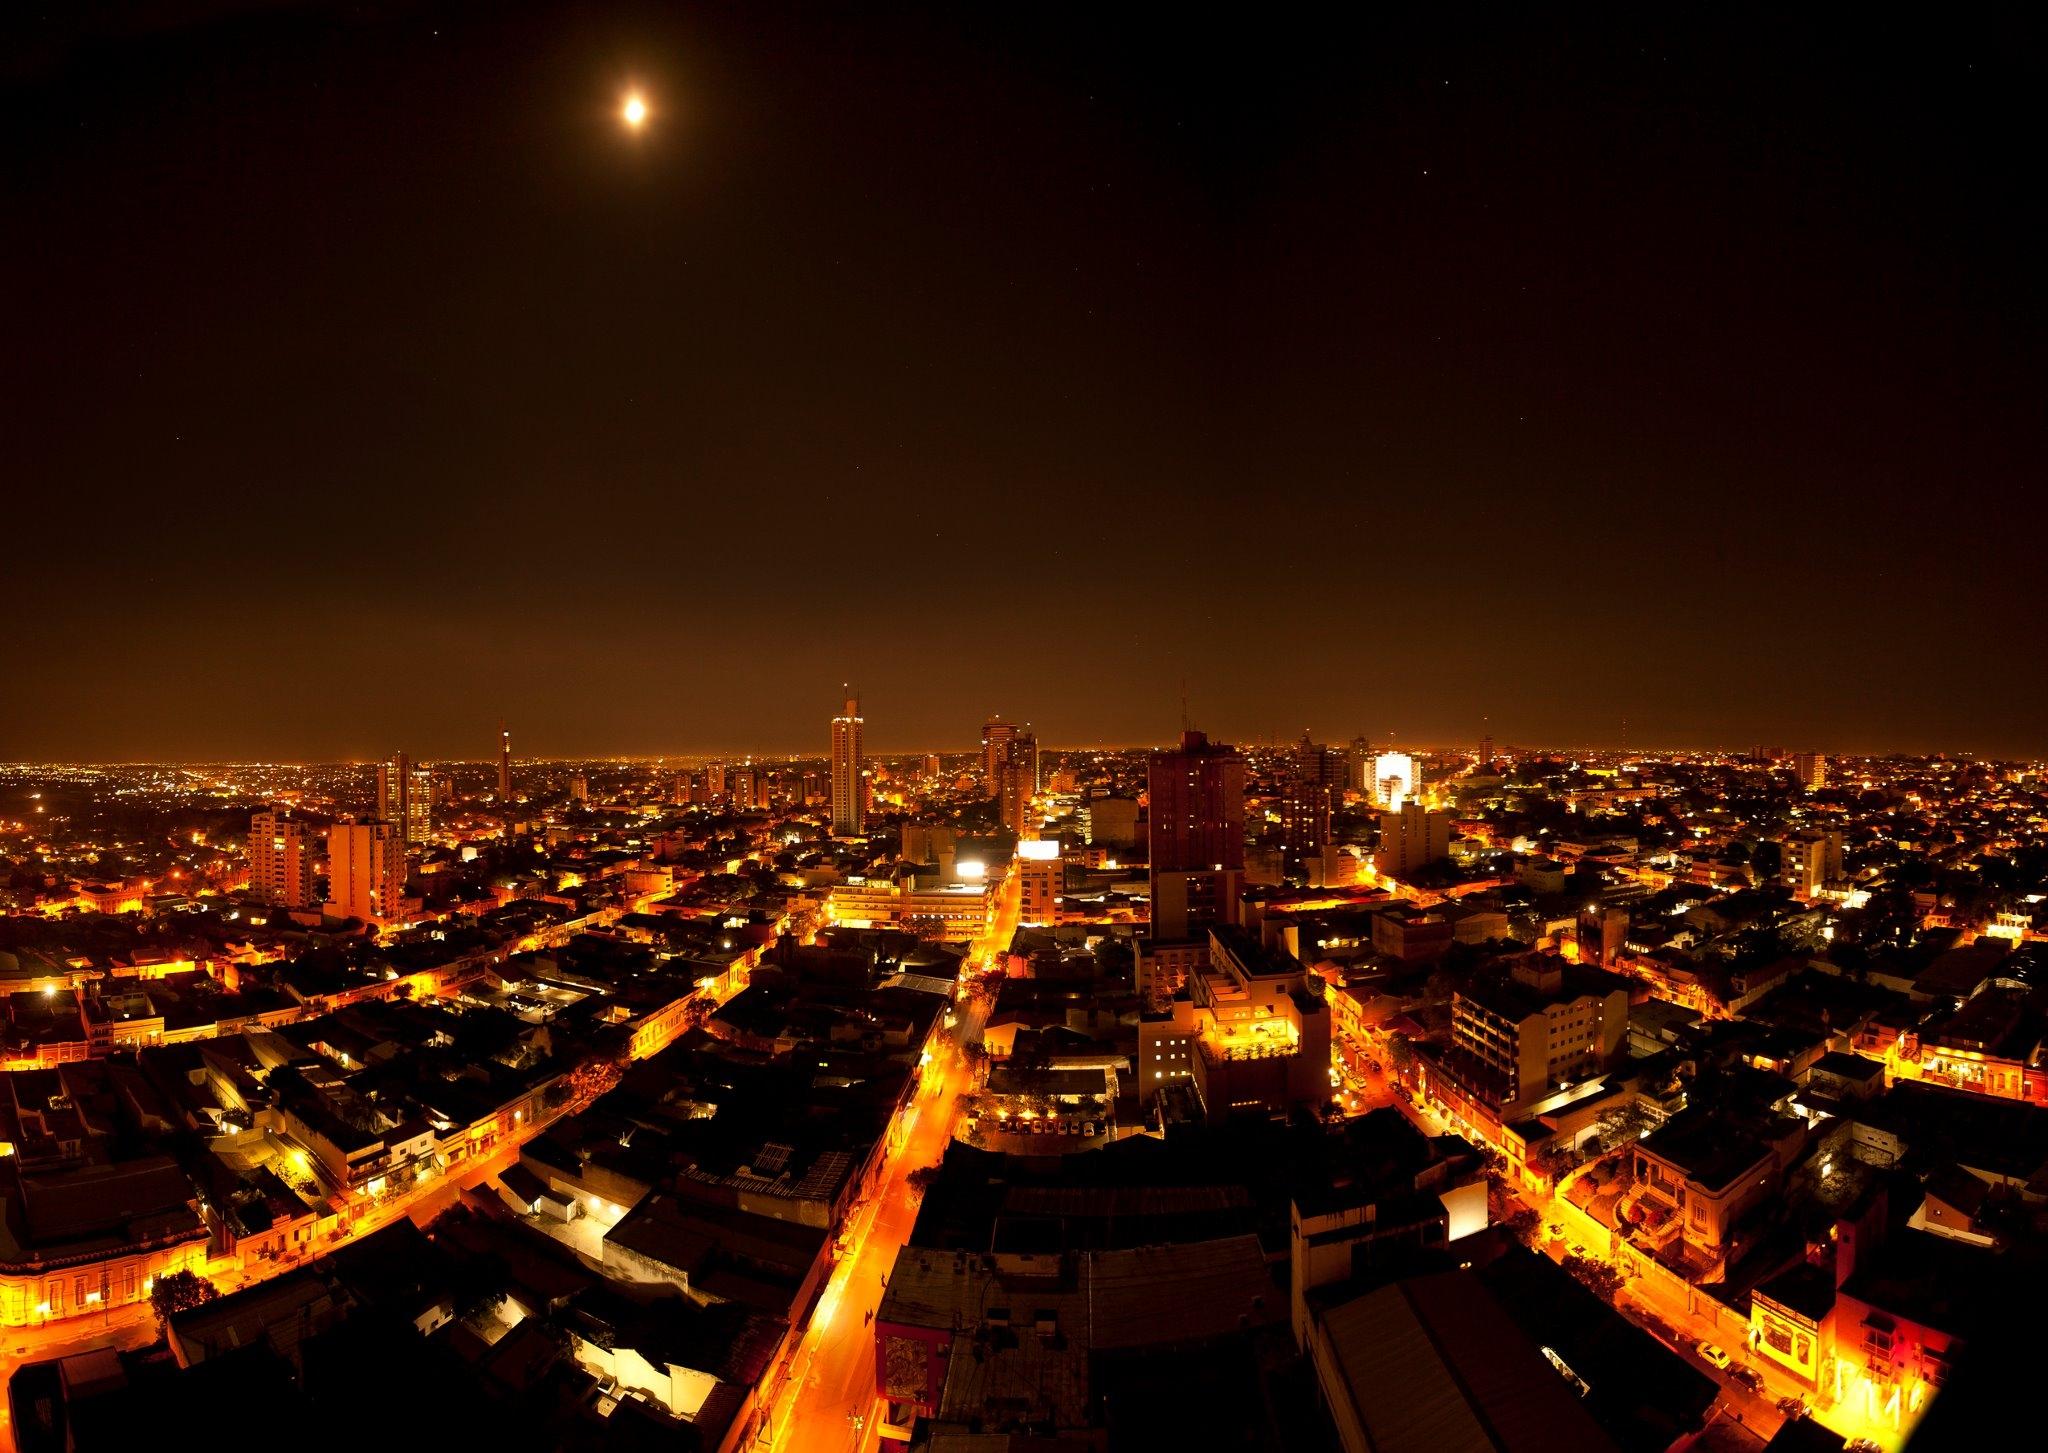 Fotografije glavnih gradova sveta - Page 3 Juan_Augusto_Sosa_Ocampos_-_T%C3%ADtulo_Brillante_Asunci%C3%B3n